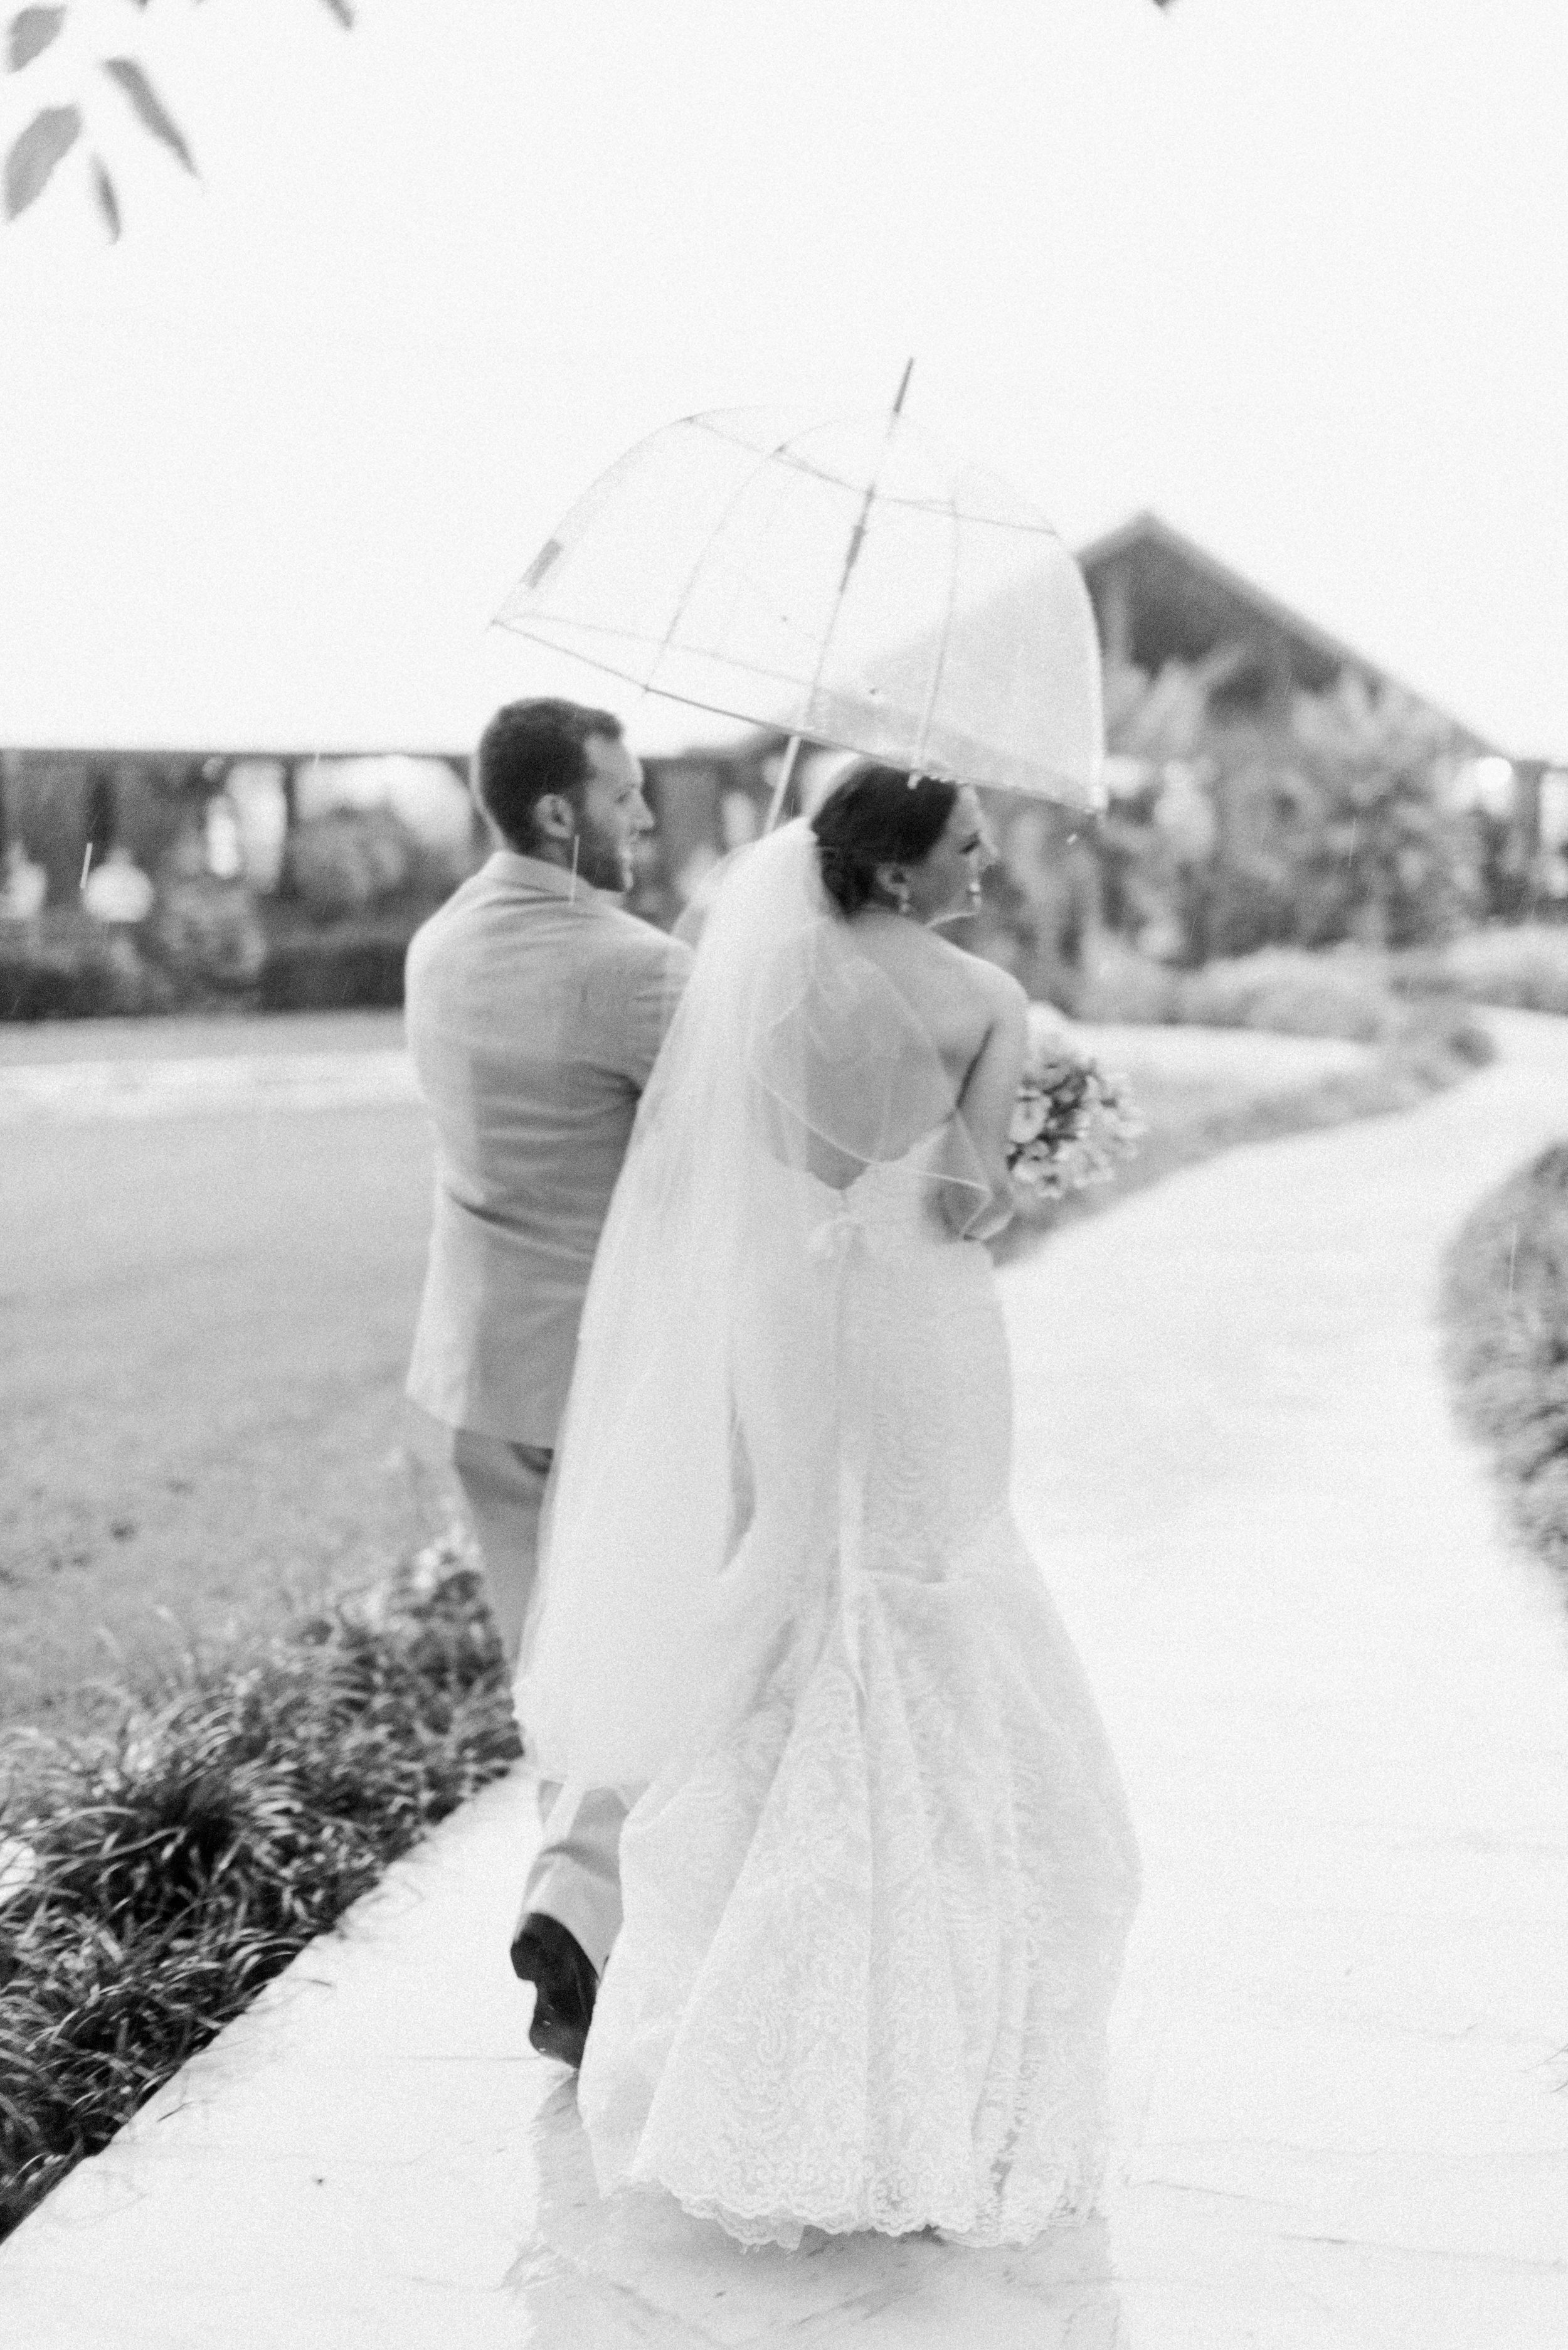 The-Knot-Wedding-Houston-Photographer-Fine-Art-Dana-Fernandez-Photography-Film-17.jpg